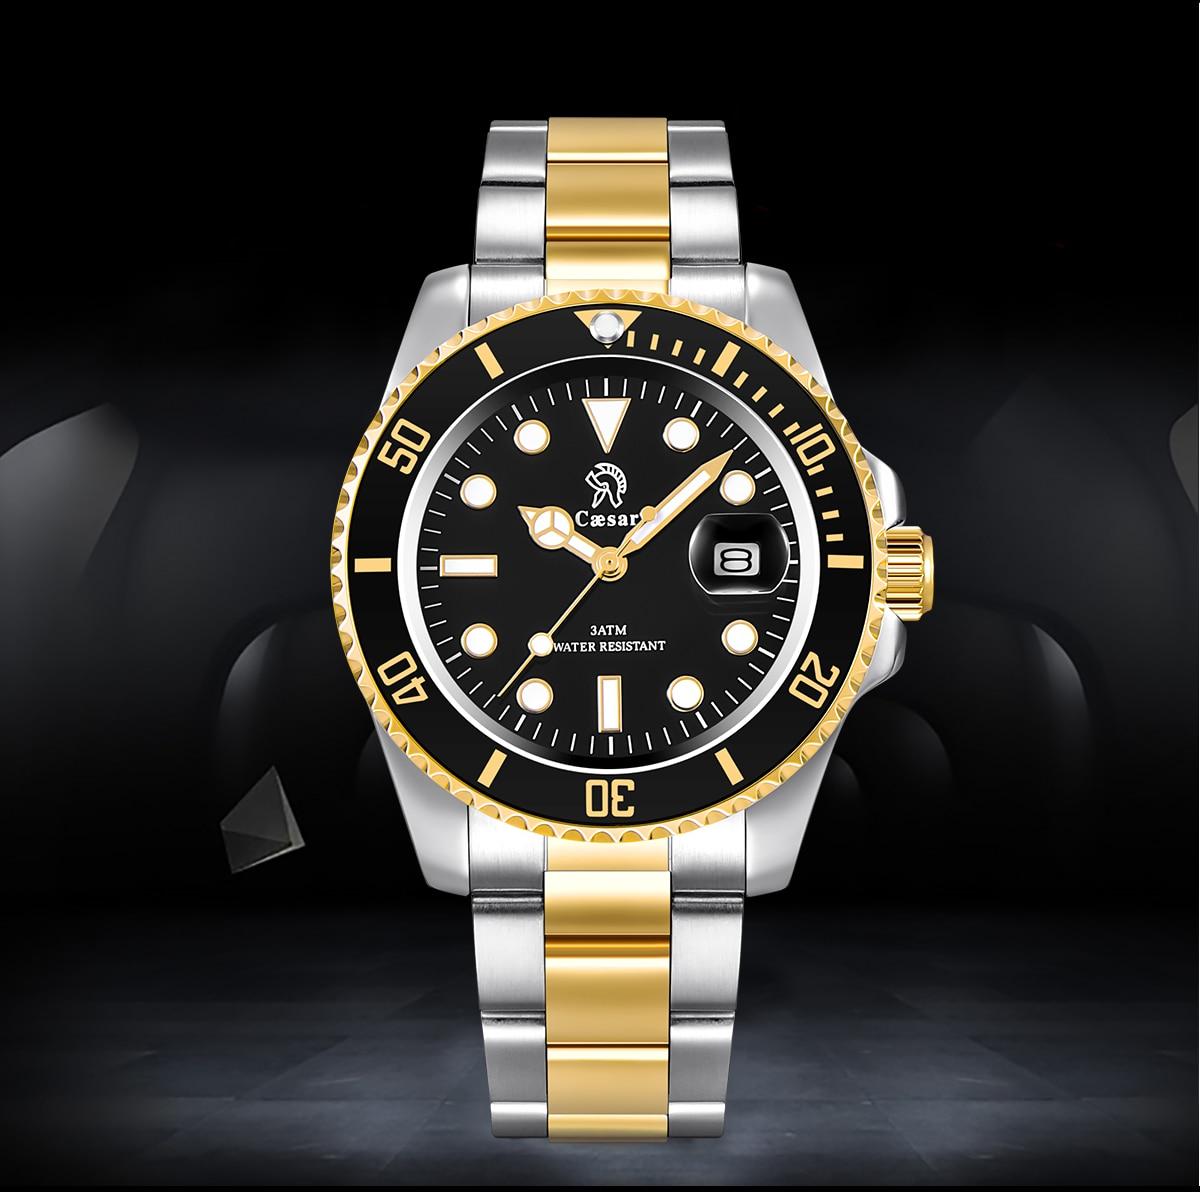 Ha0e24cd09b4d4102a377b8d0495d21de1 Rose Gold caesar  Top Brand Luxury Watches